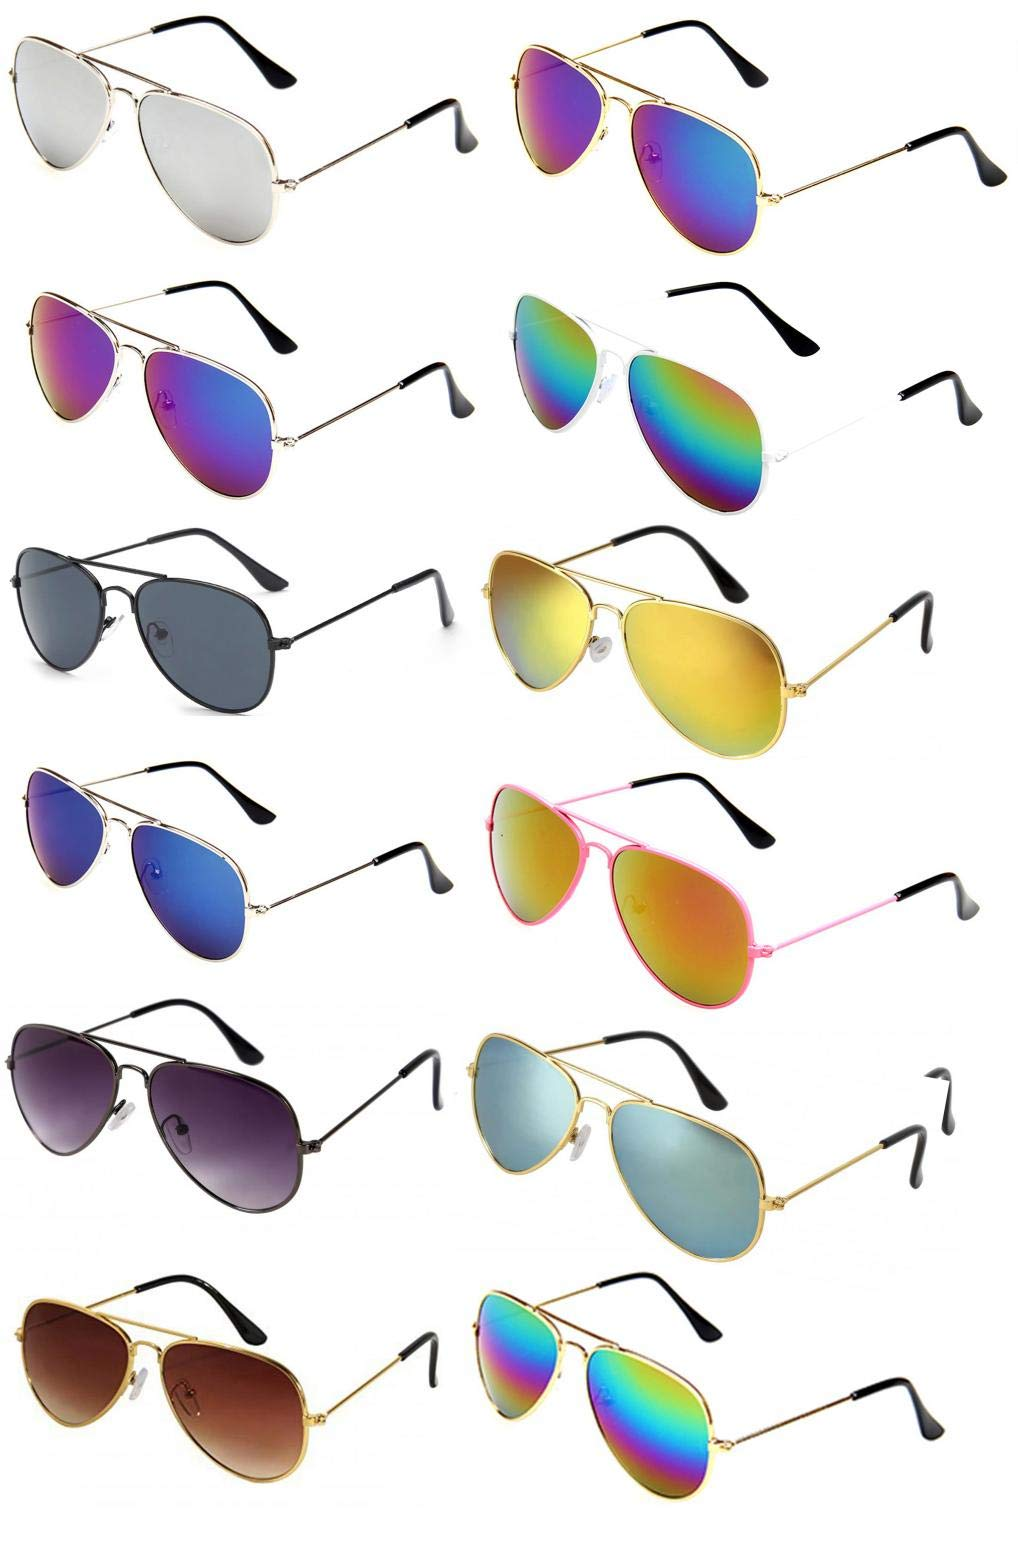 WODISON Classic Kids Aviator Sunglasses Bulk Metal Frame Children Party Eyeglasses 12 Packs